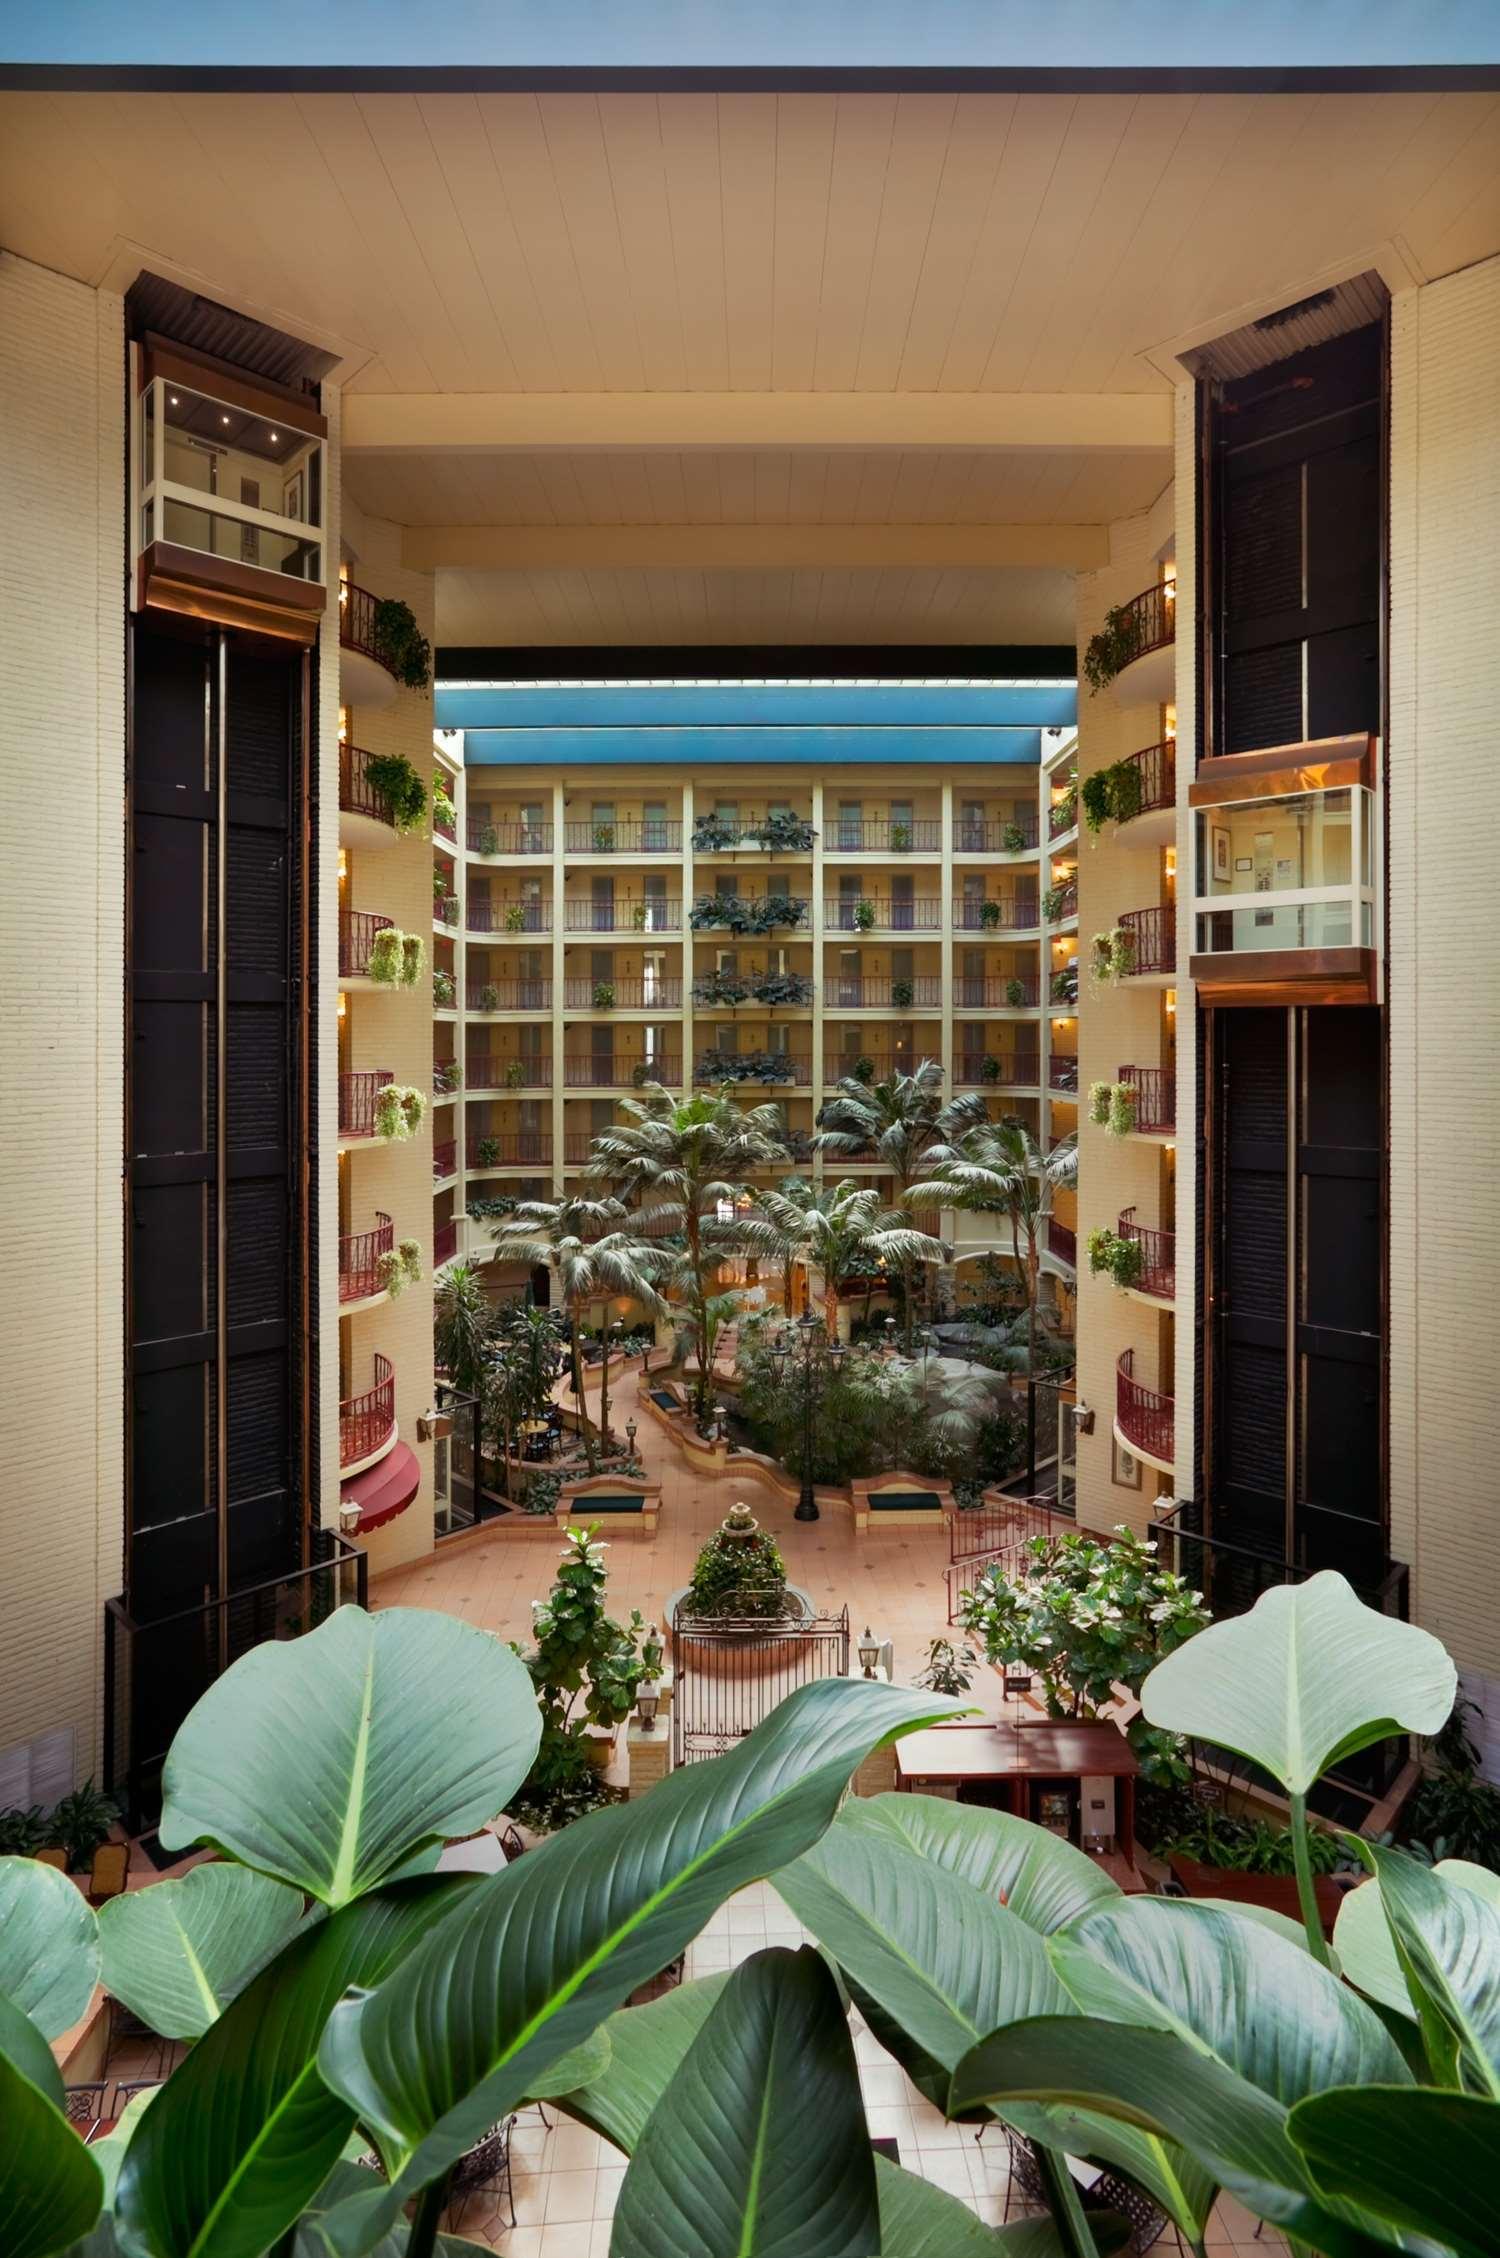 Embassy Suites by Hilton Arcadia Pasadena Area image 5